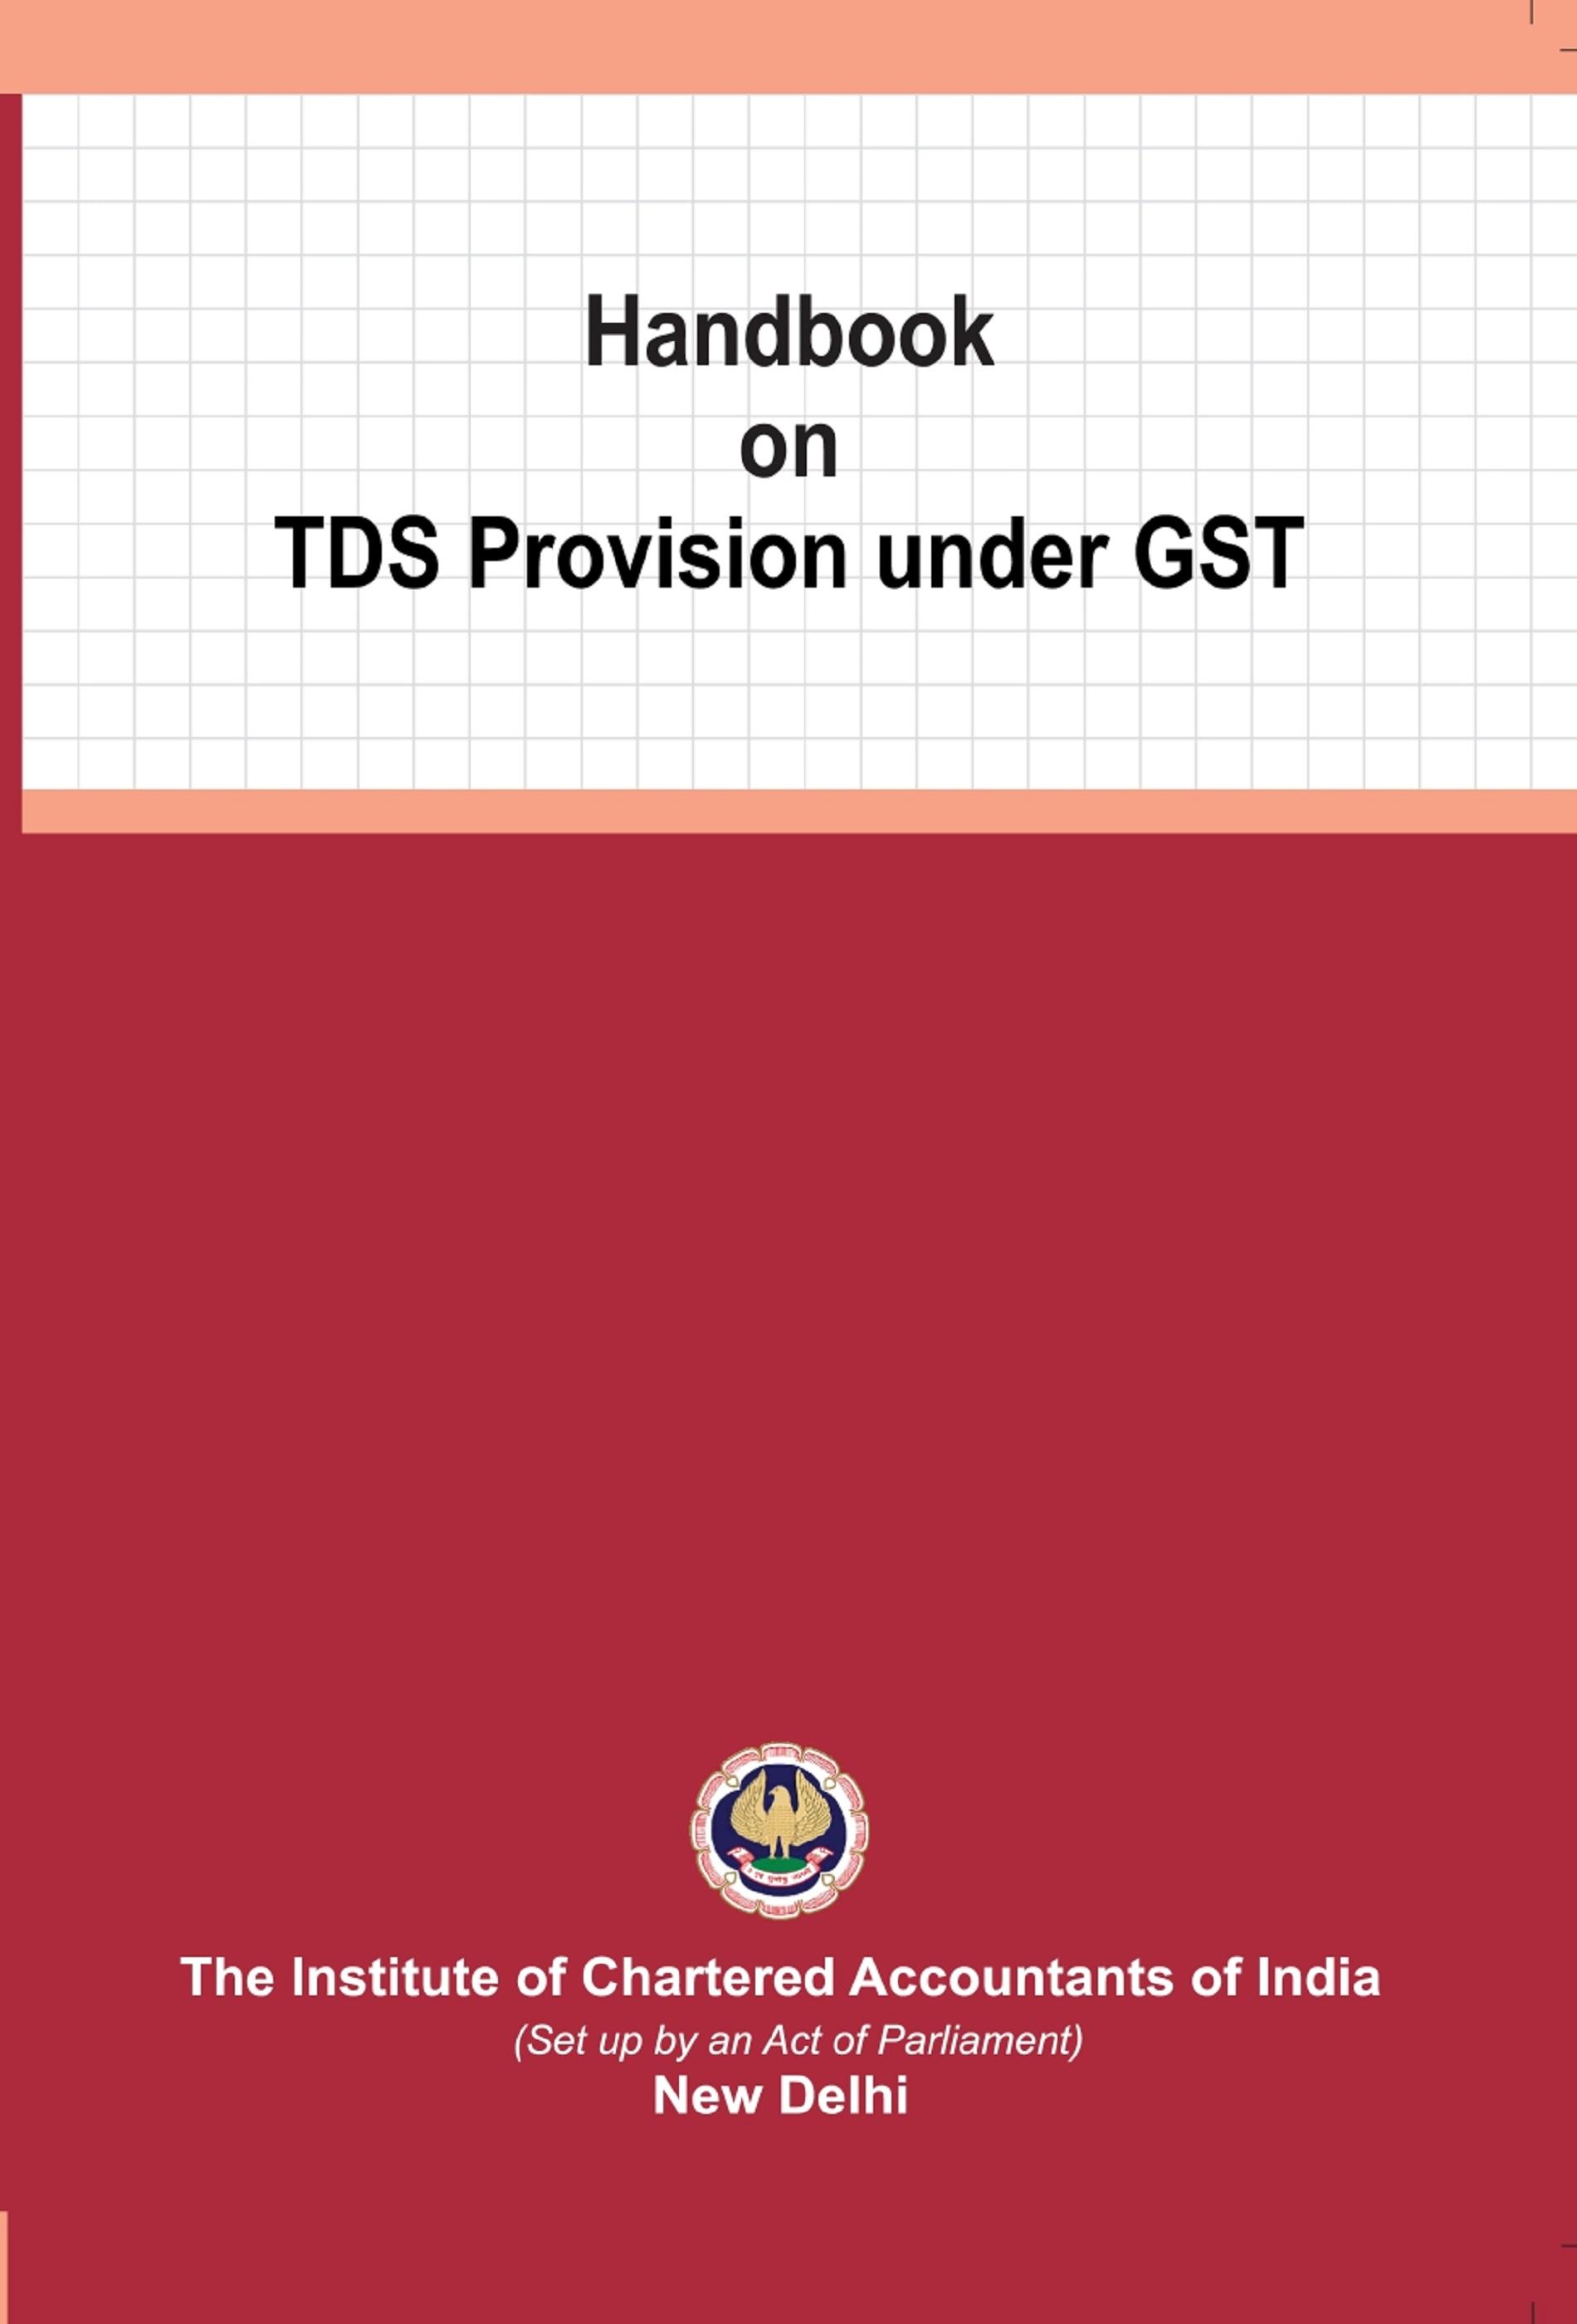 Handbook on TDS Provision under GST (May, 2020)